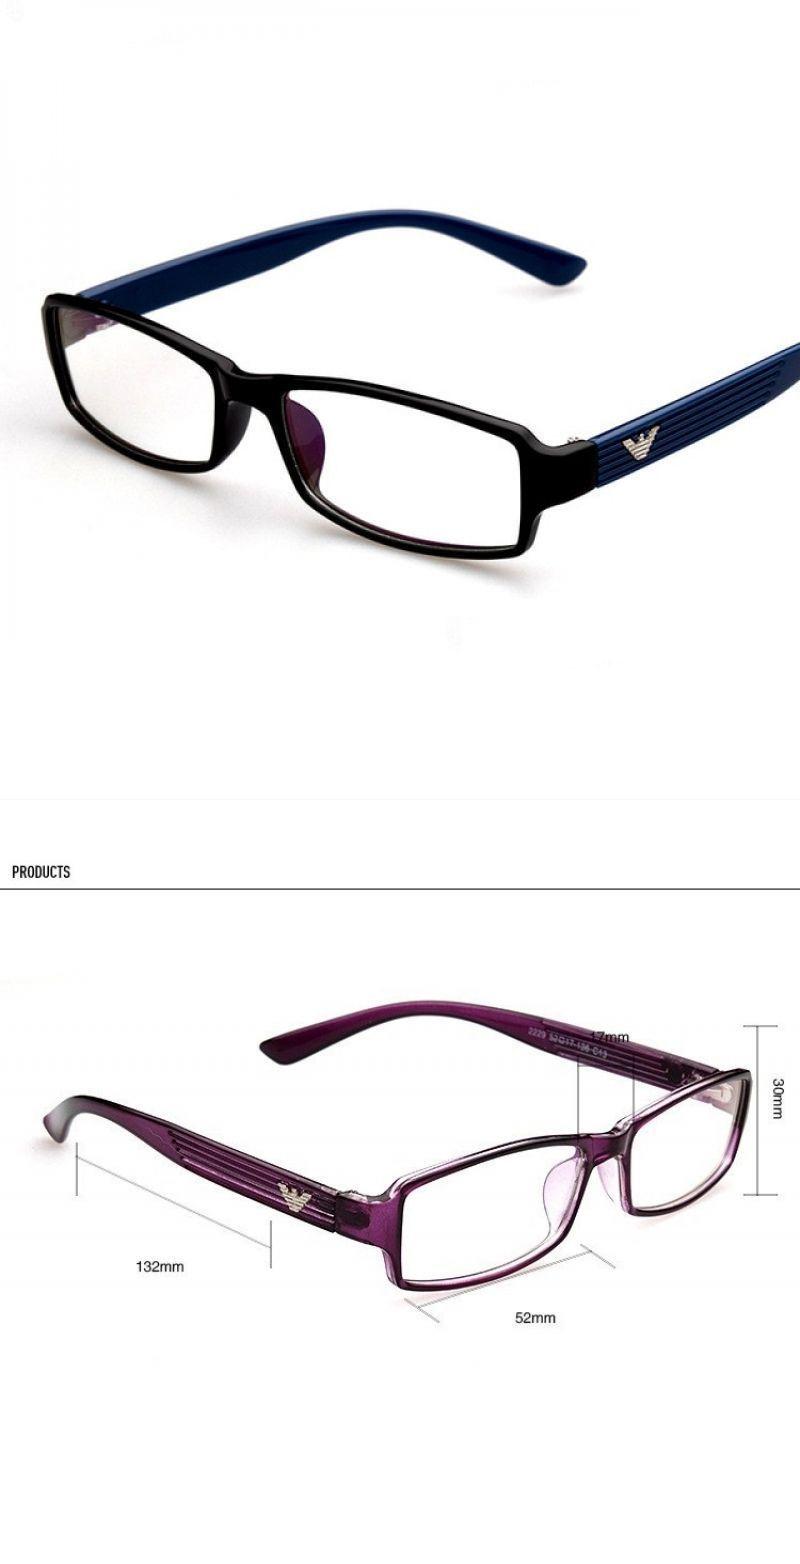 1d58834cb55 Retro rectangle shape fashion clear eyewear frame men women cosy optical  eyeglasses computer glasses spectacle frame h414  eyewear  accessories   frames ...